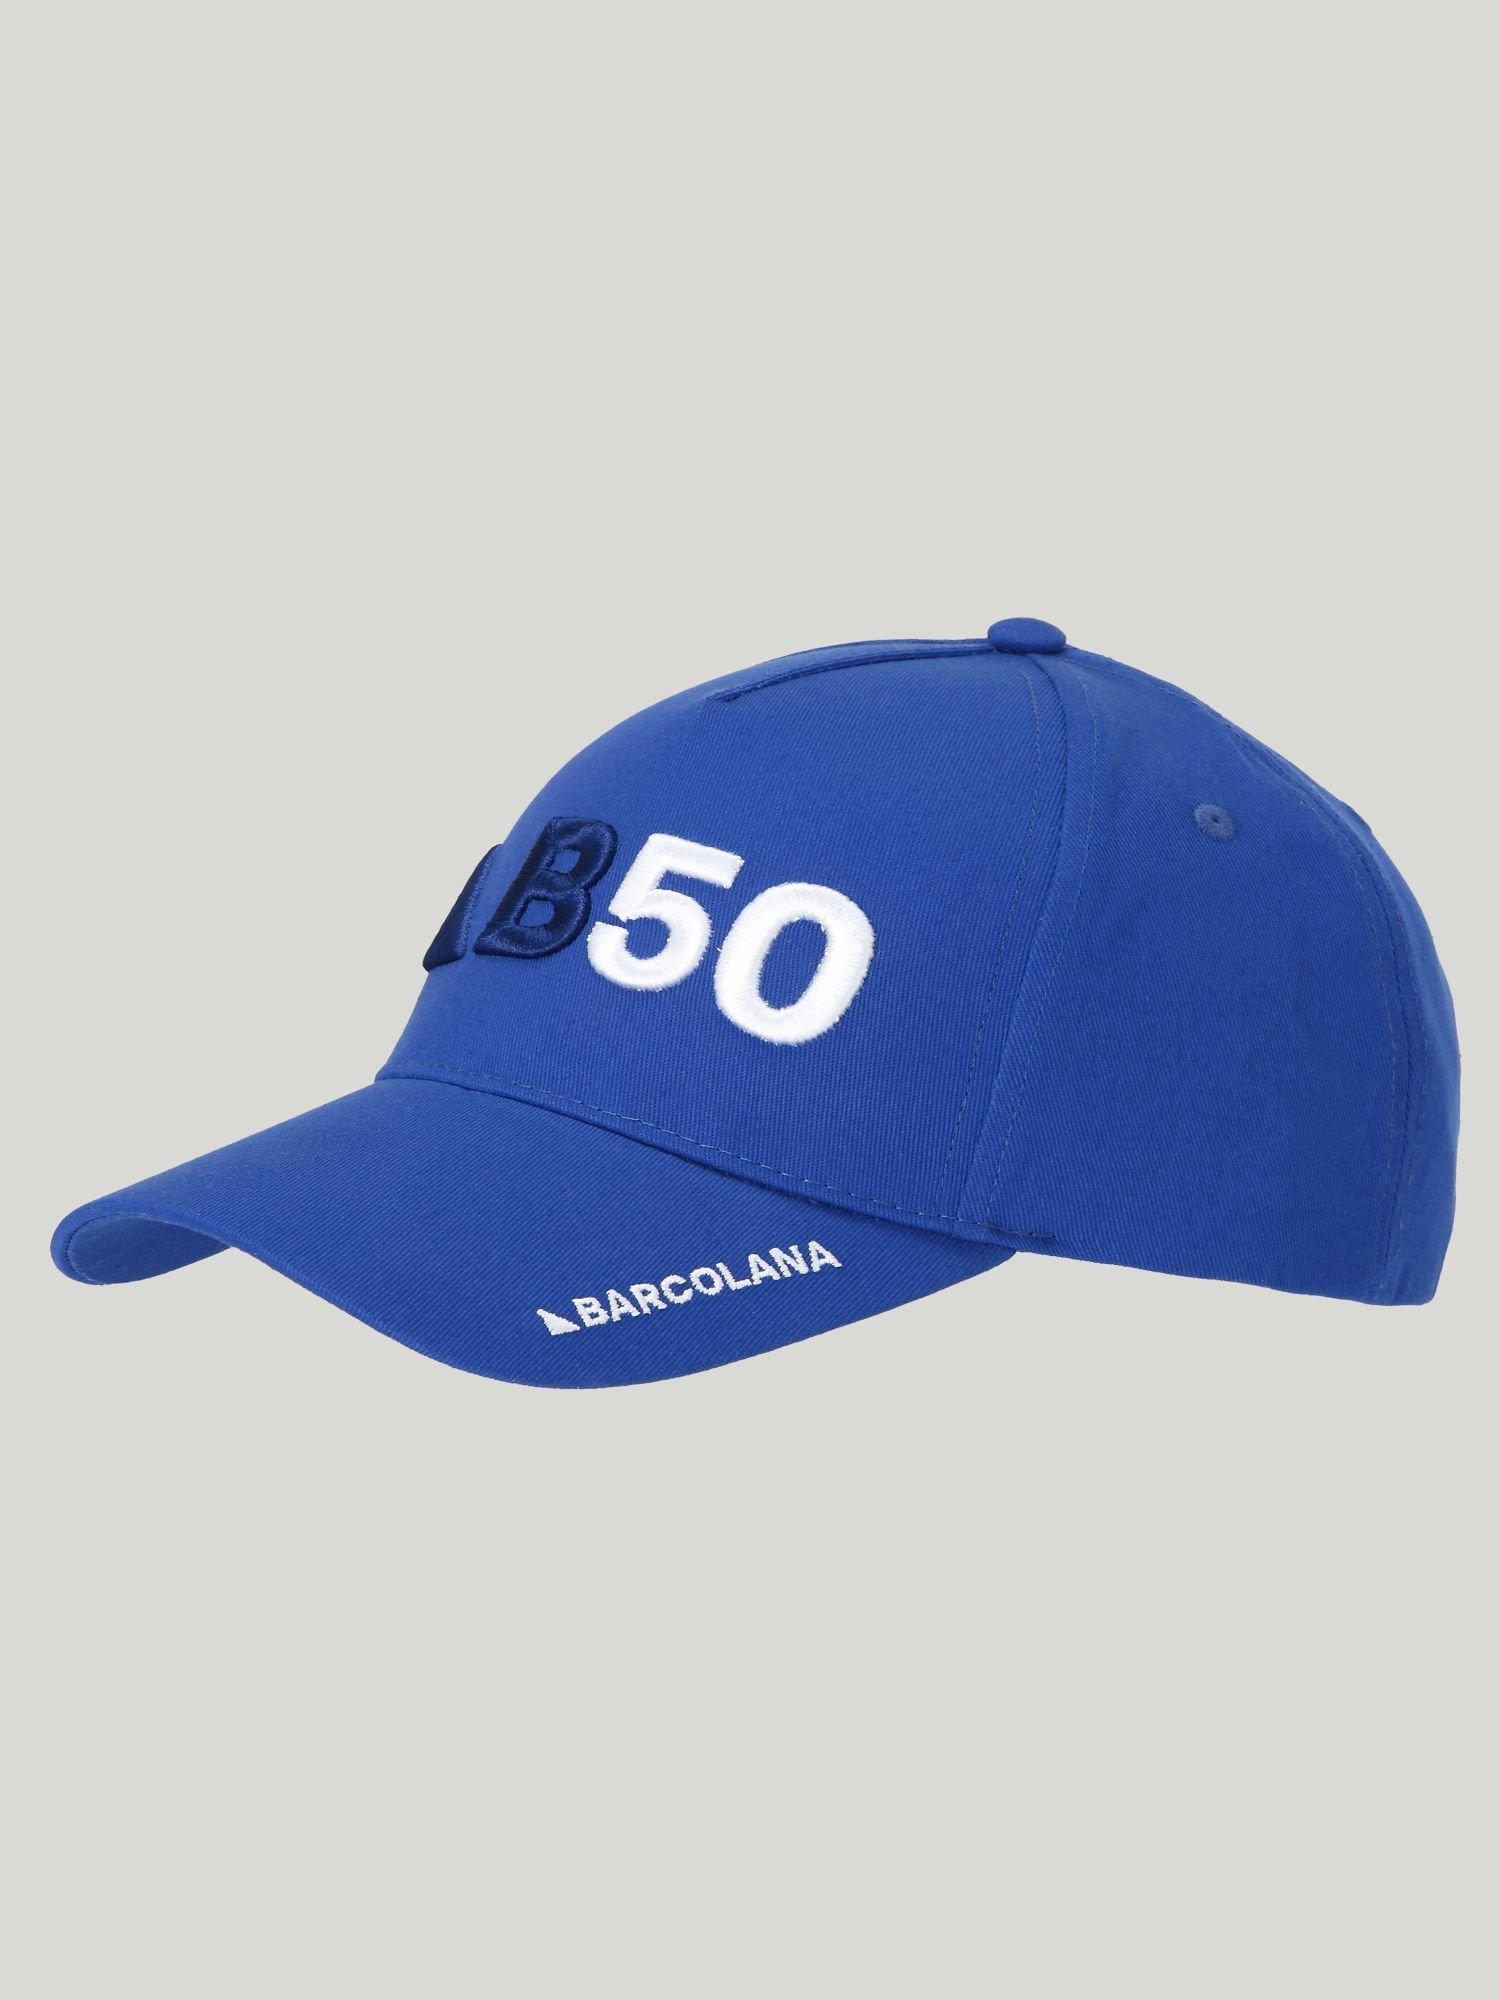 B50 cap - Marine Blue